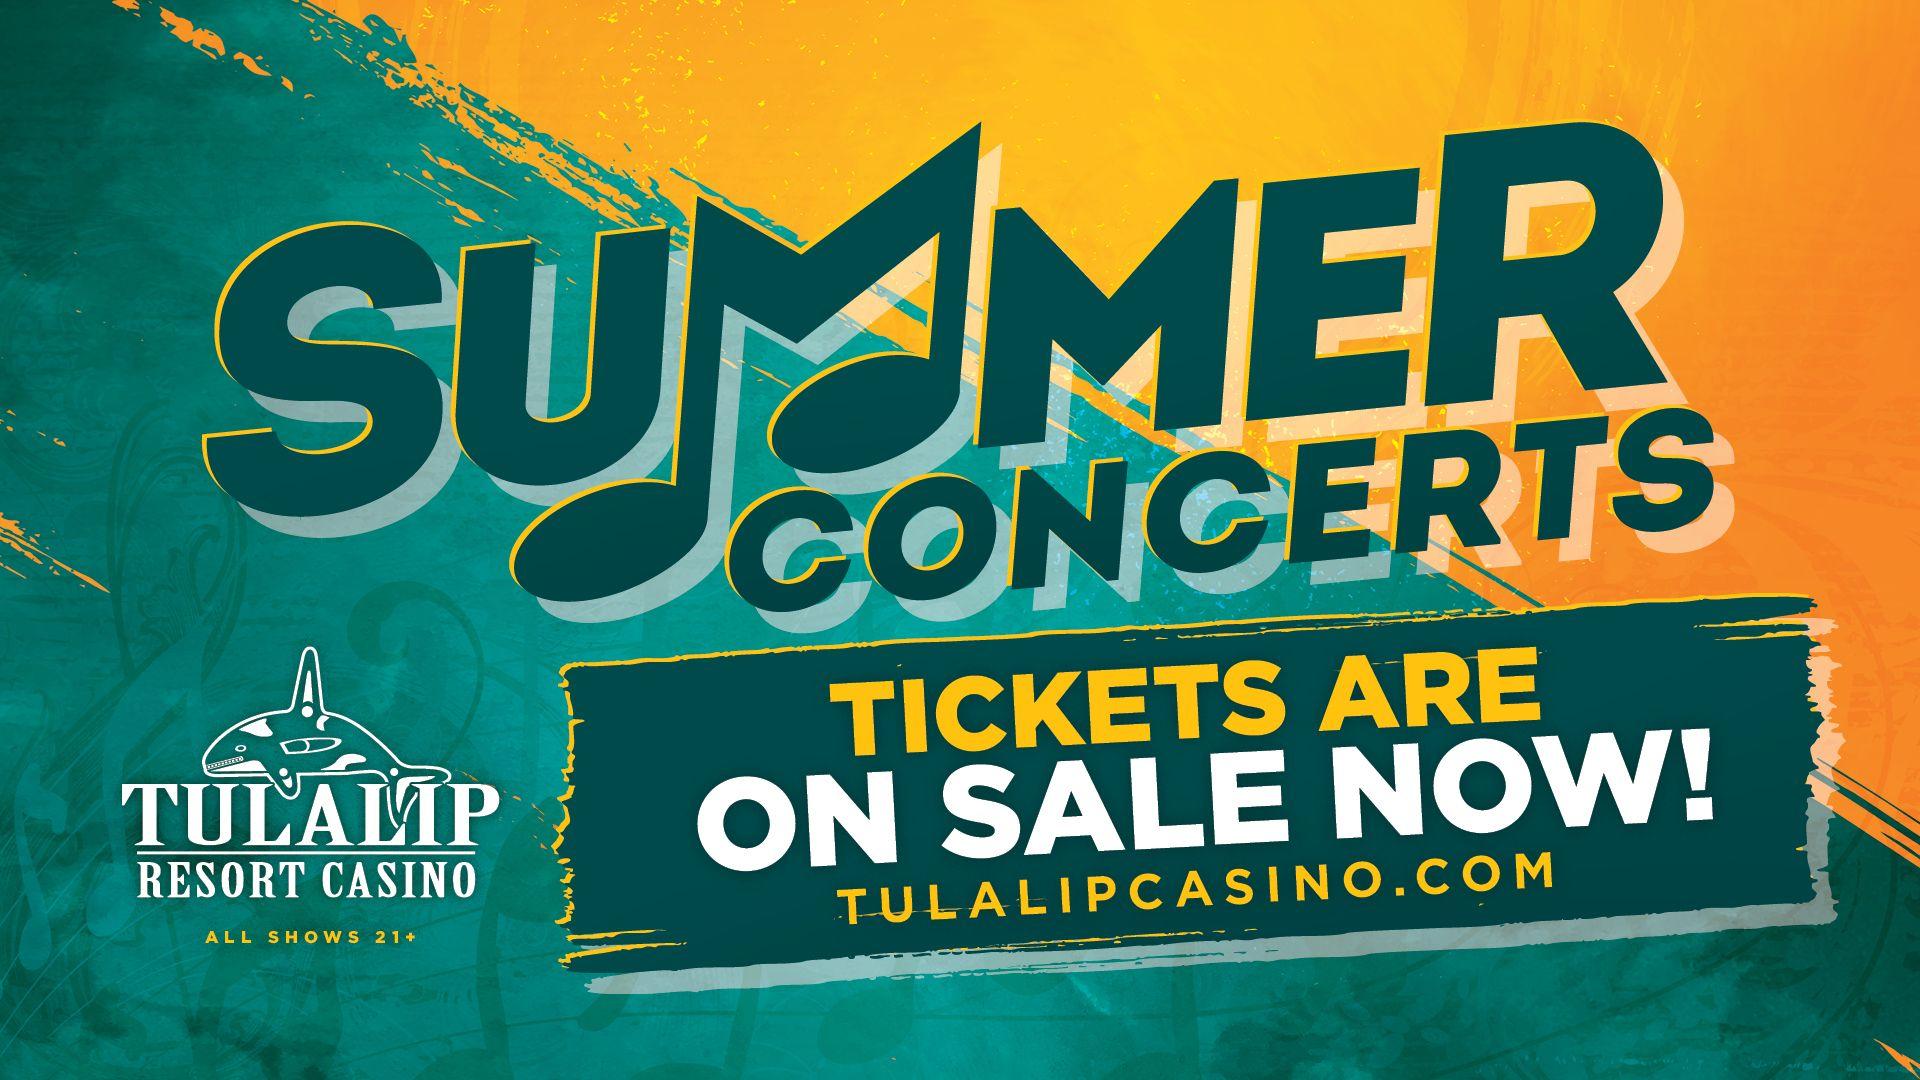 Tulalip Summer Concert Series